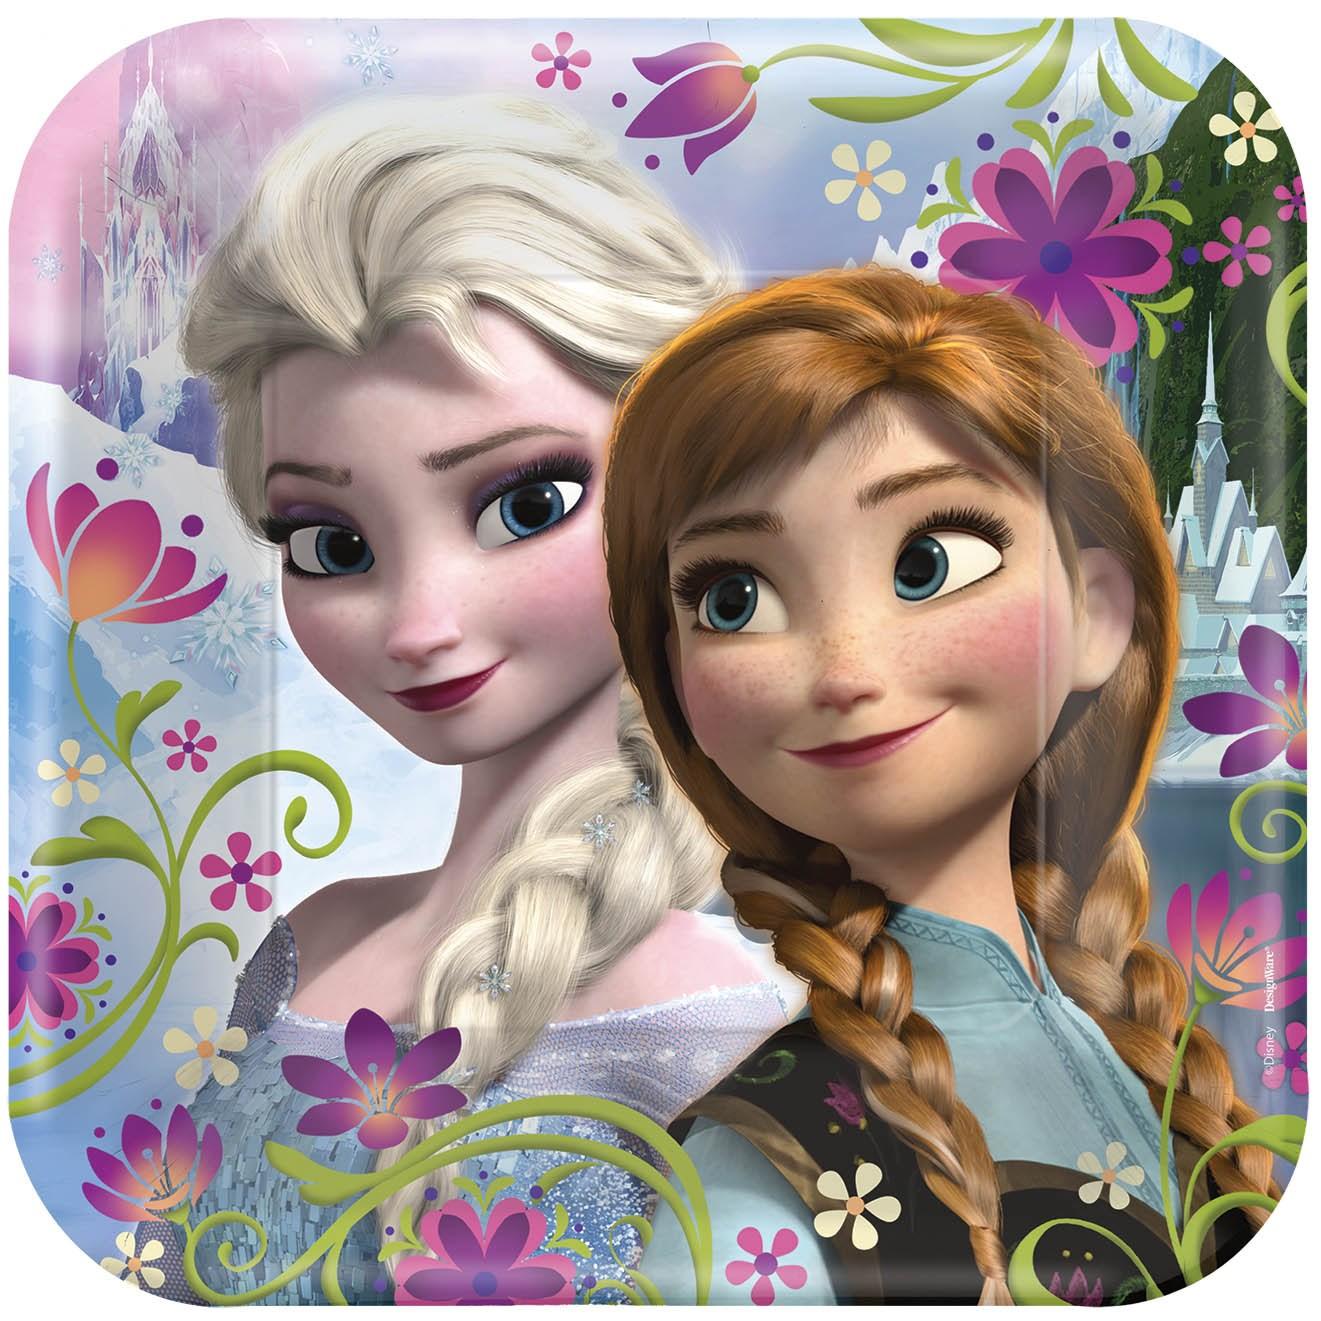 Disney Frozen Square Dinner Plates BirthdayExpresscom